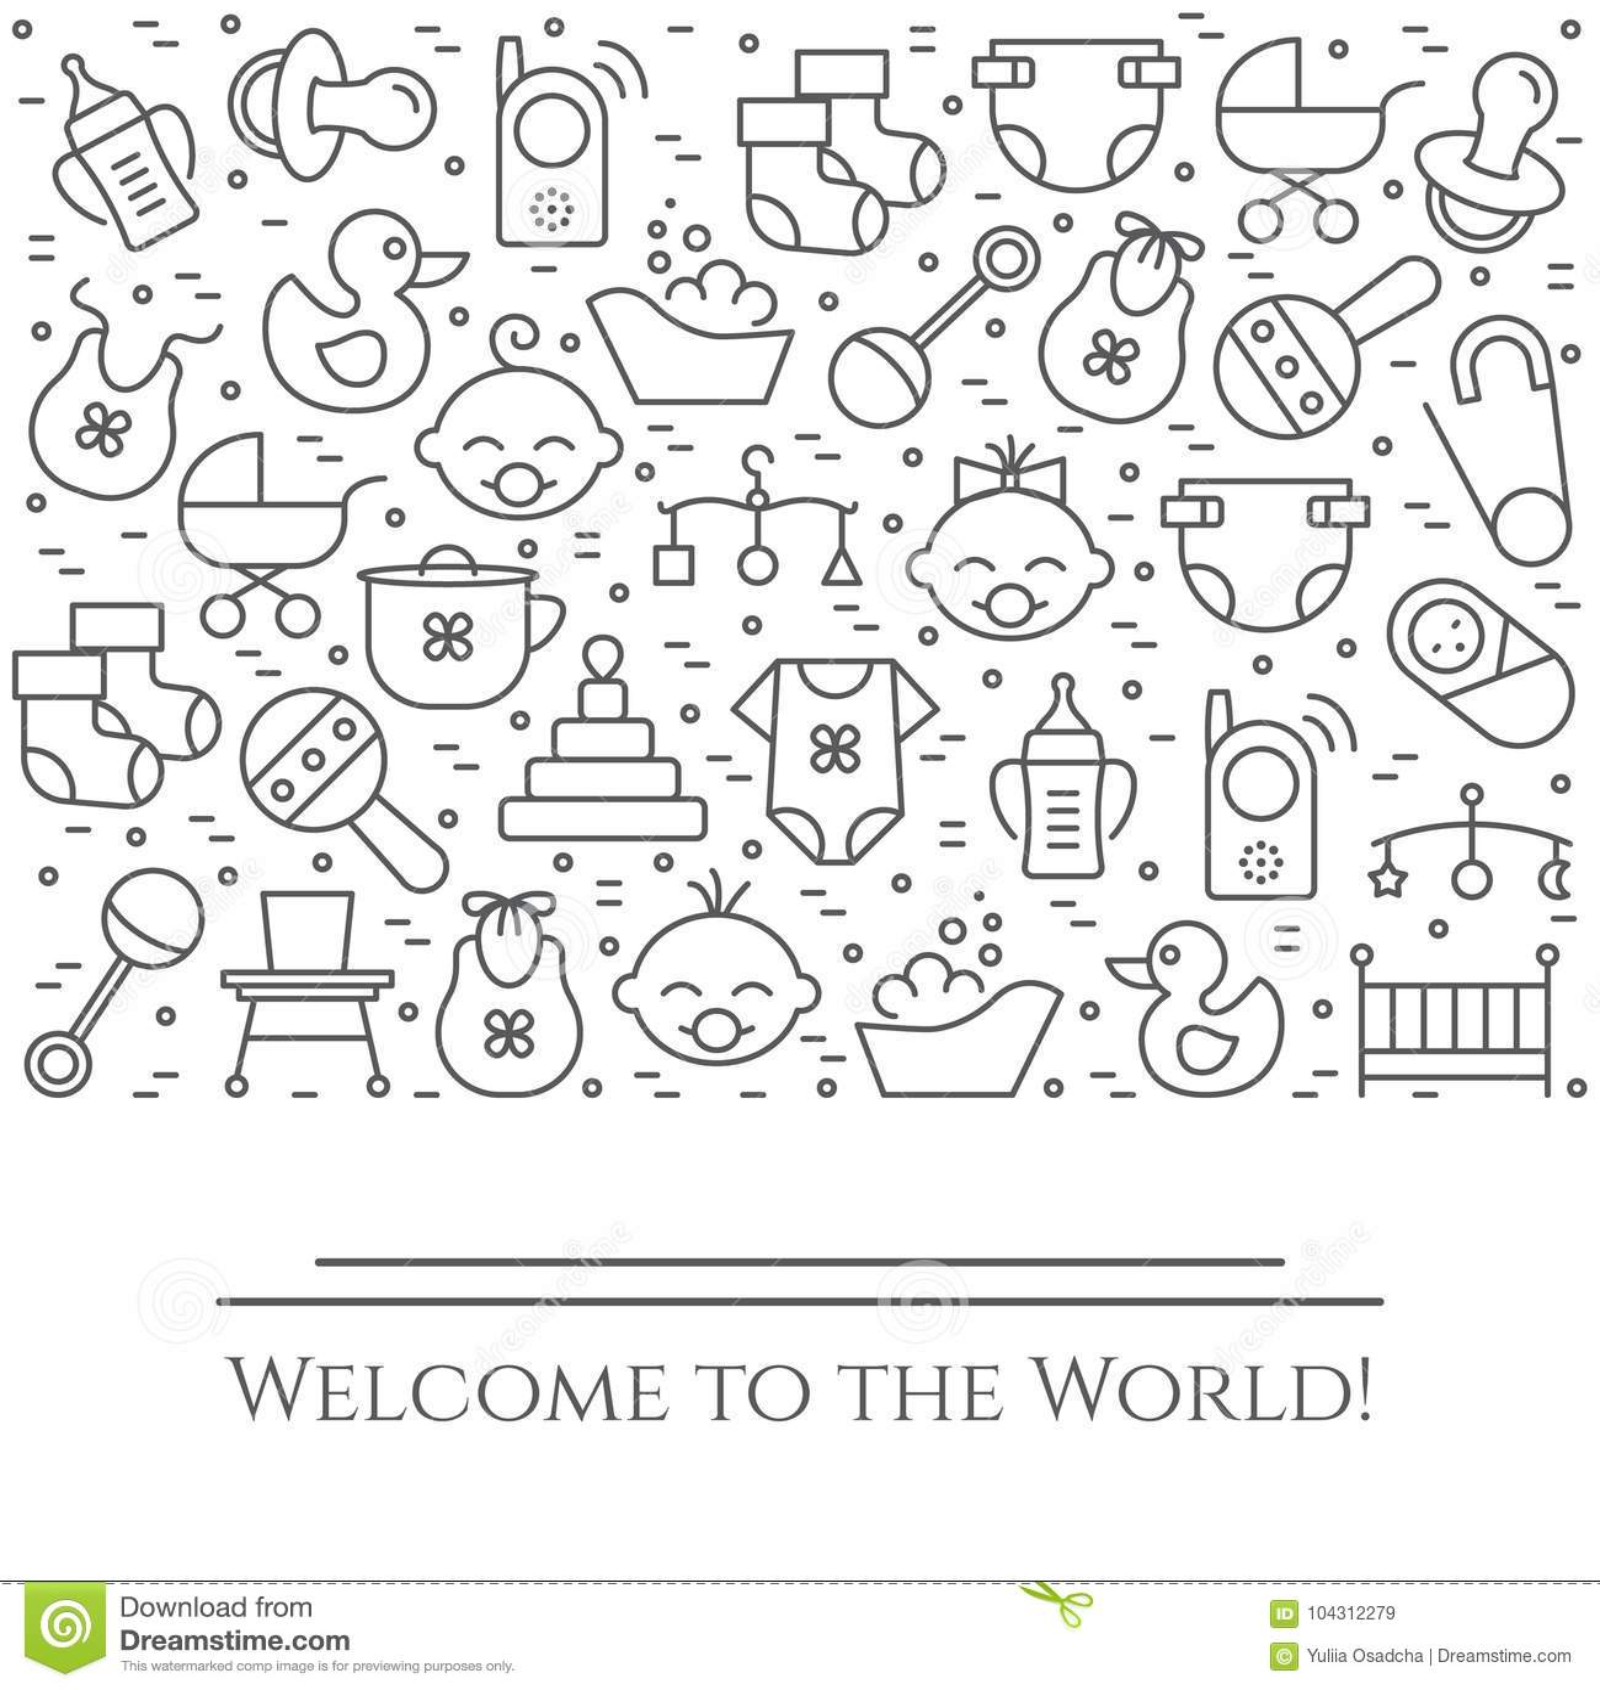 Baby theme horizontal banner. Pictograms of baby, pram, crib, mobile, toys, rattle, bottle, diaper, bathtub, bib and other newborn